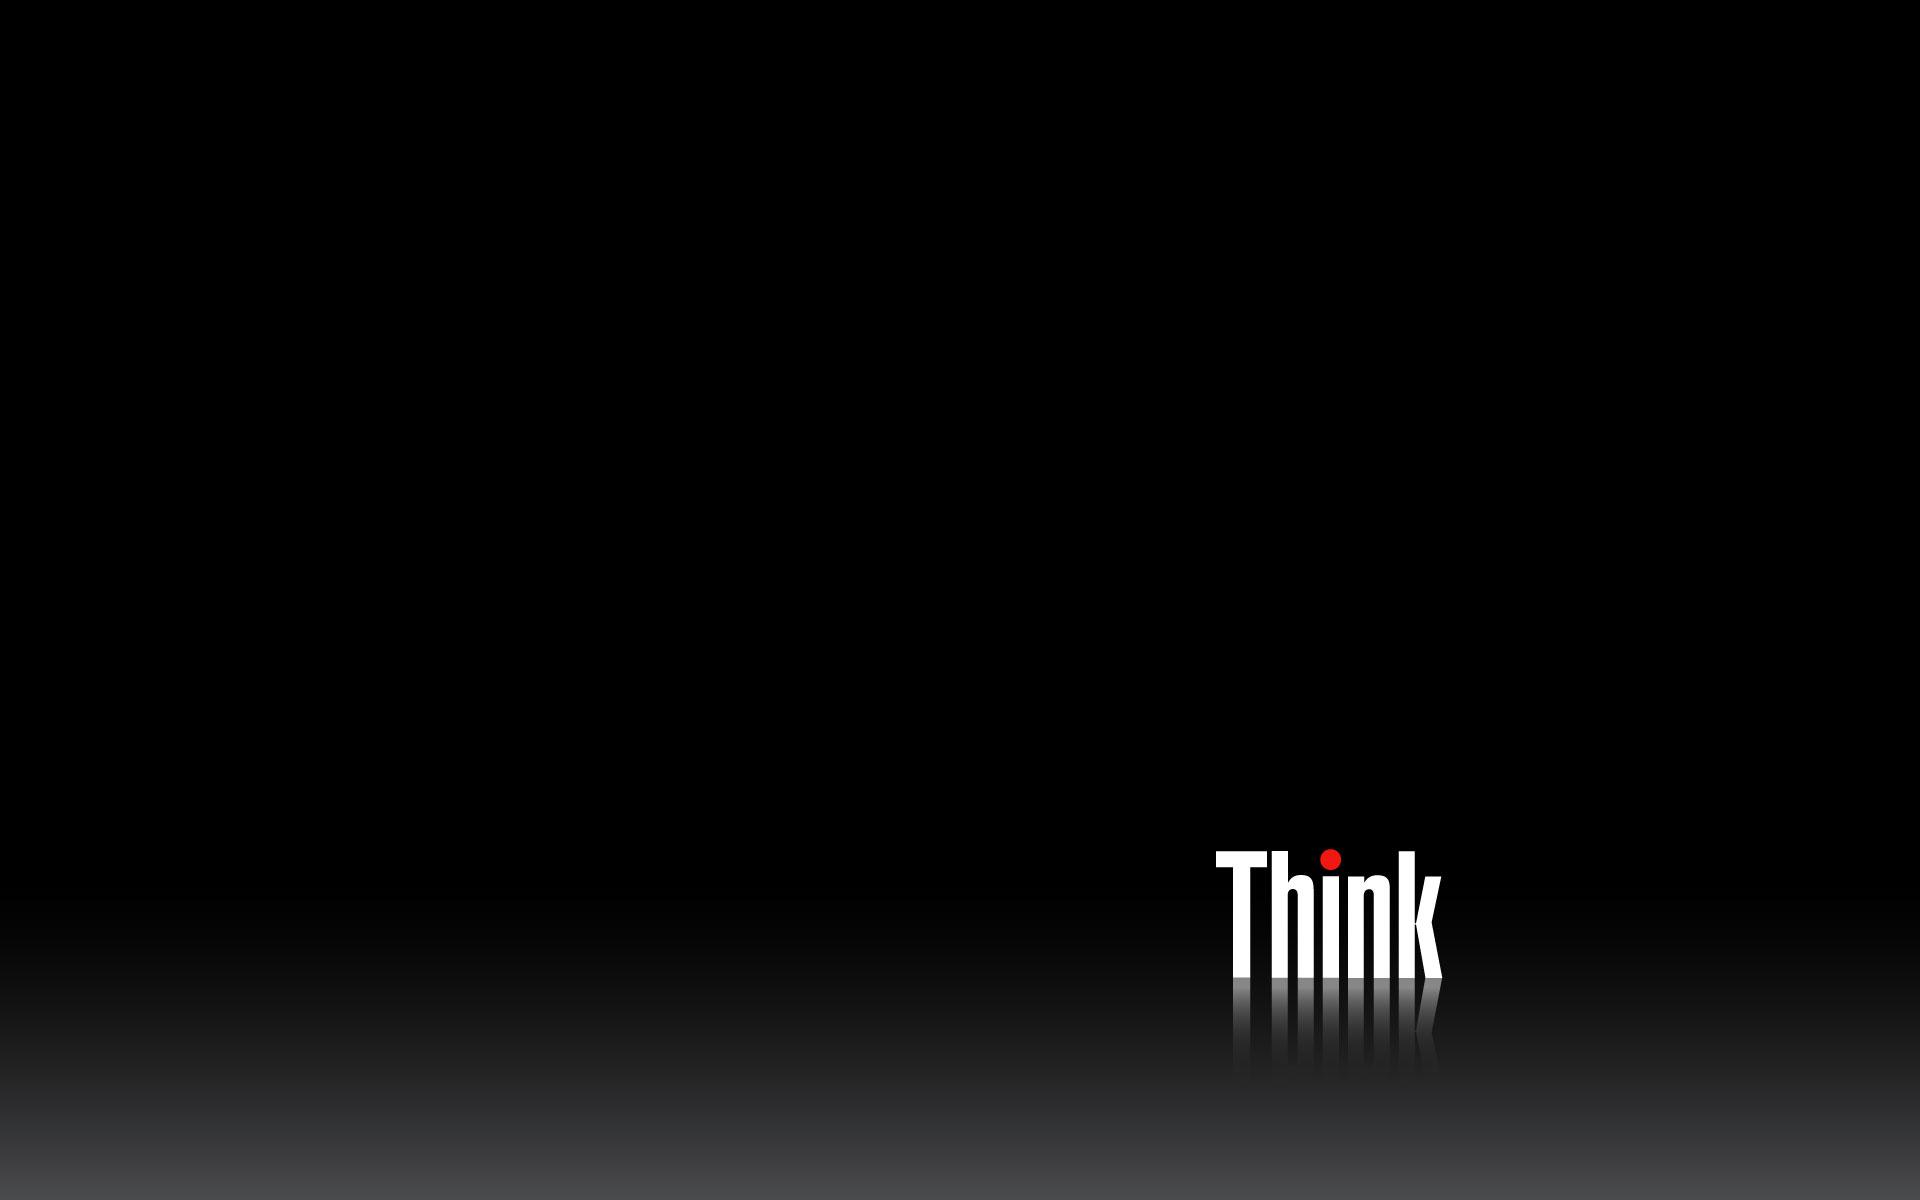 Lenovo Wallpaper Car: ThinkPad Wallpaper HD